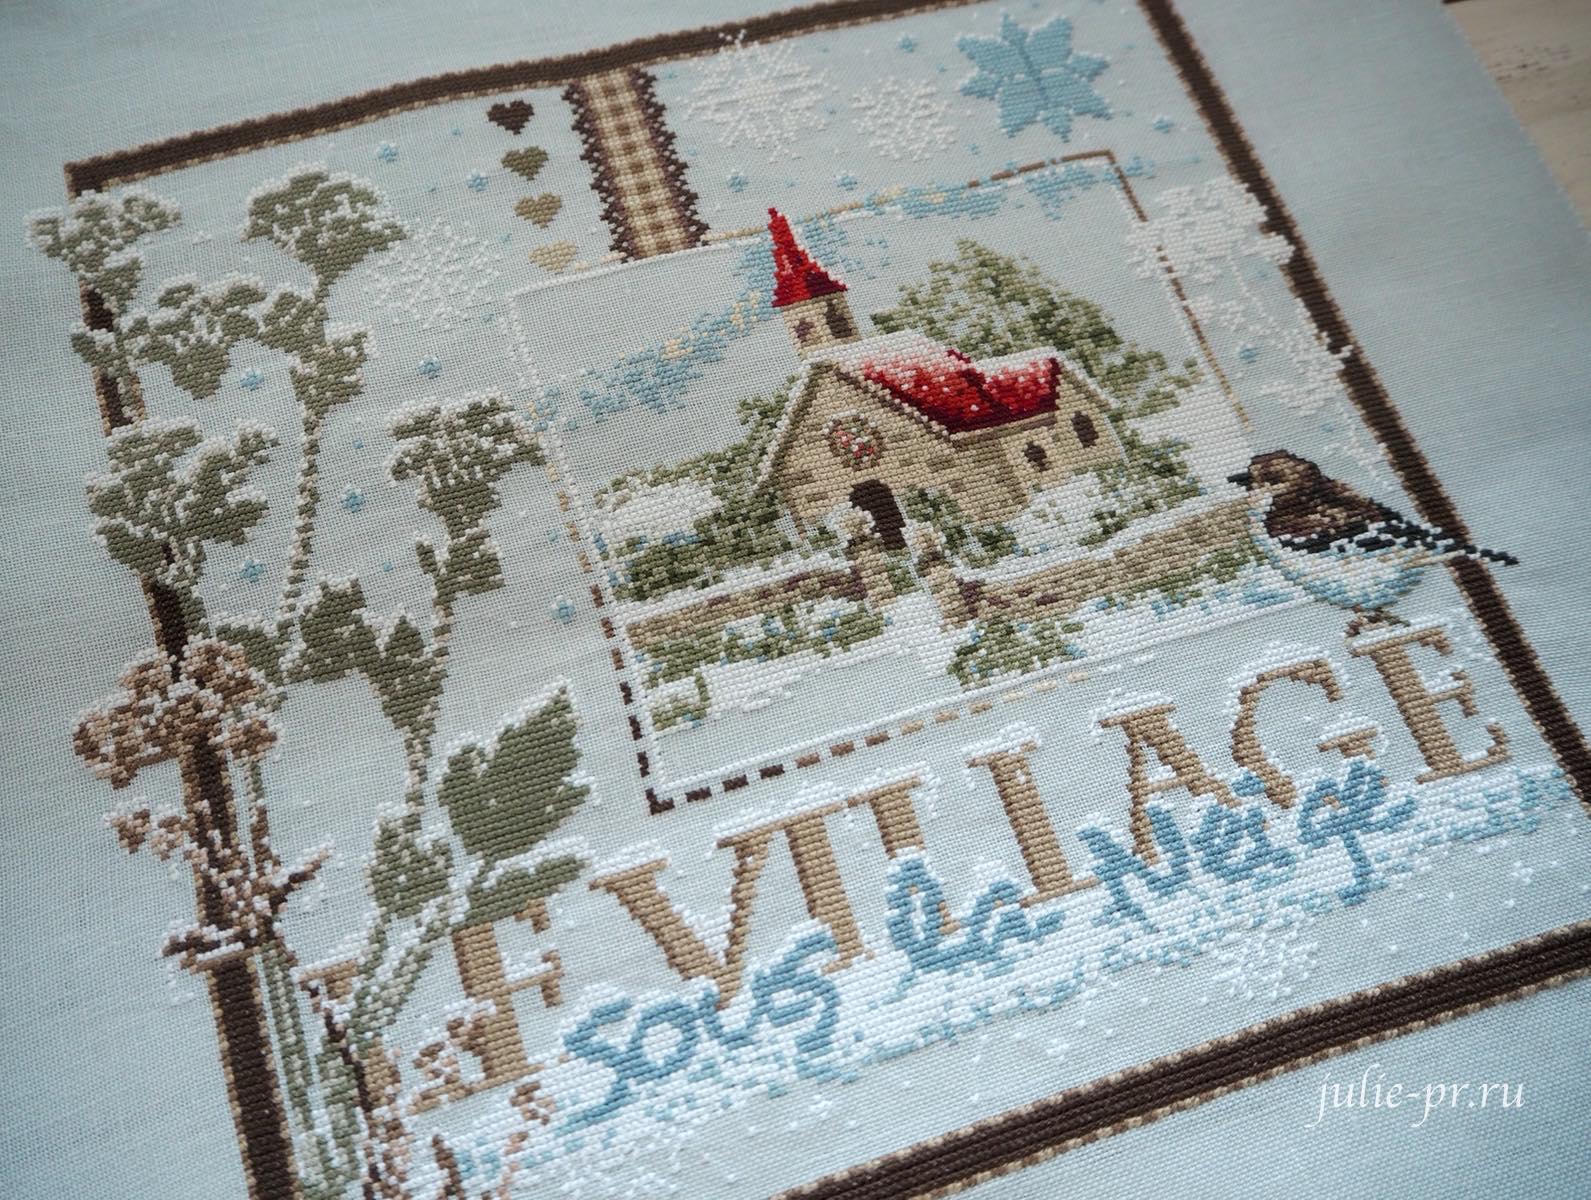 вышивка крестом, Madame la Fee, Le Village sous la Neige, Заснеженная деревня, французская вышивка